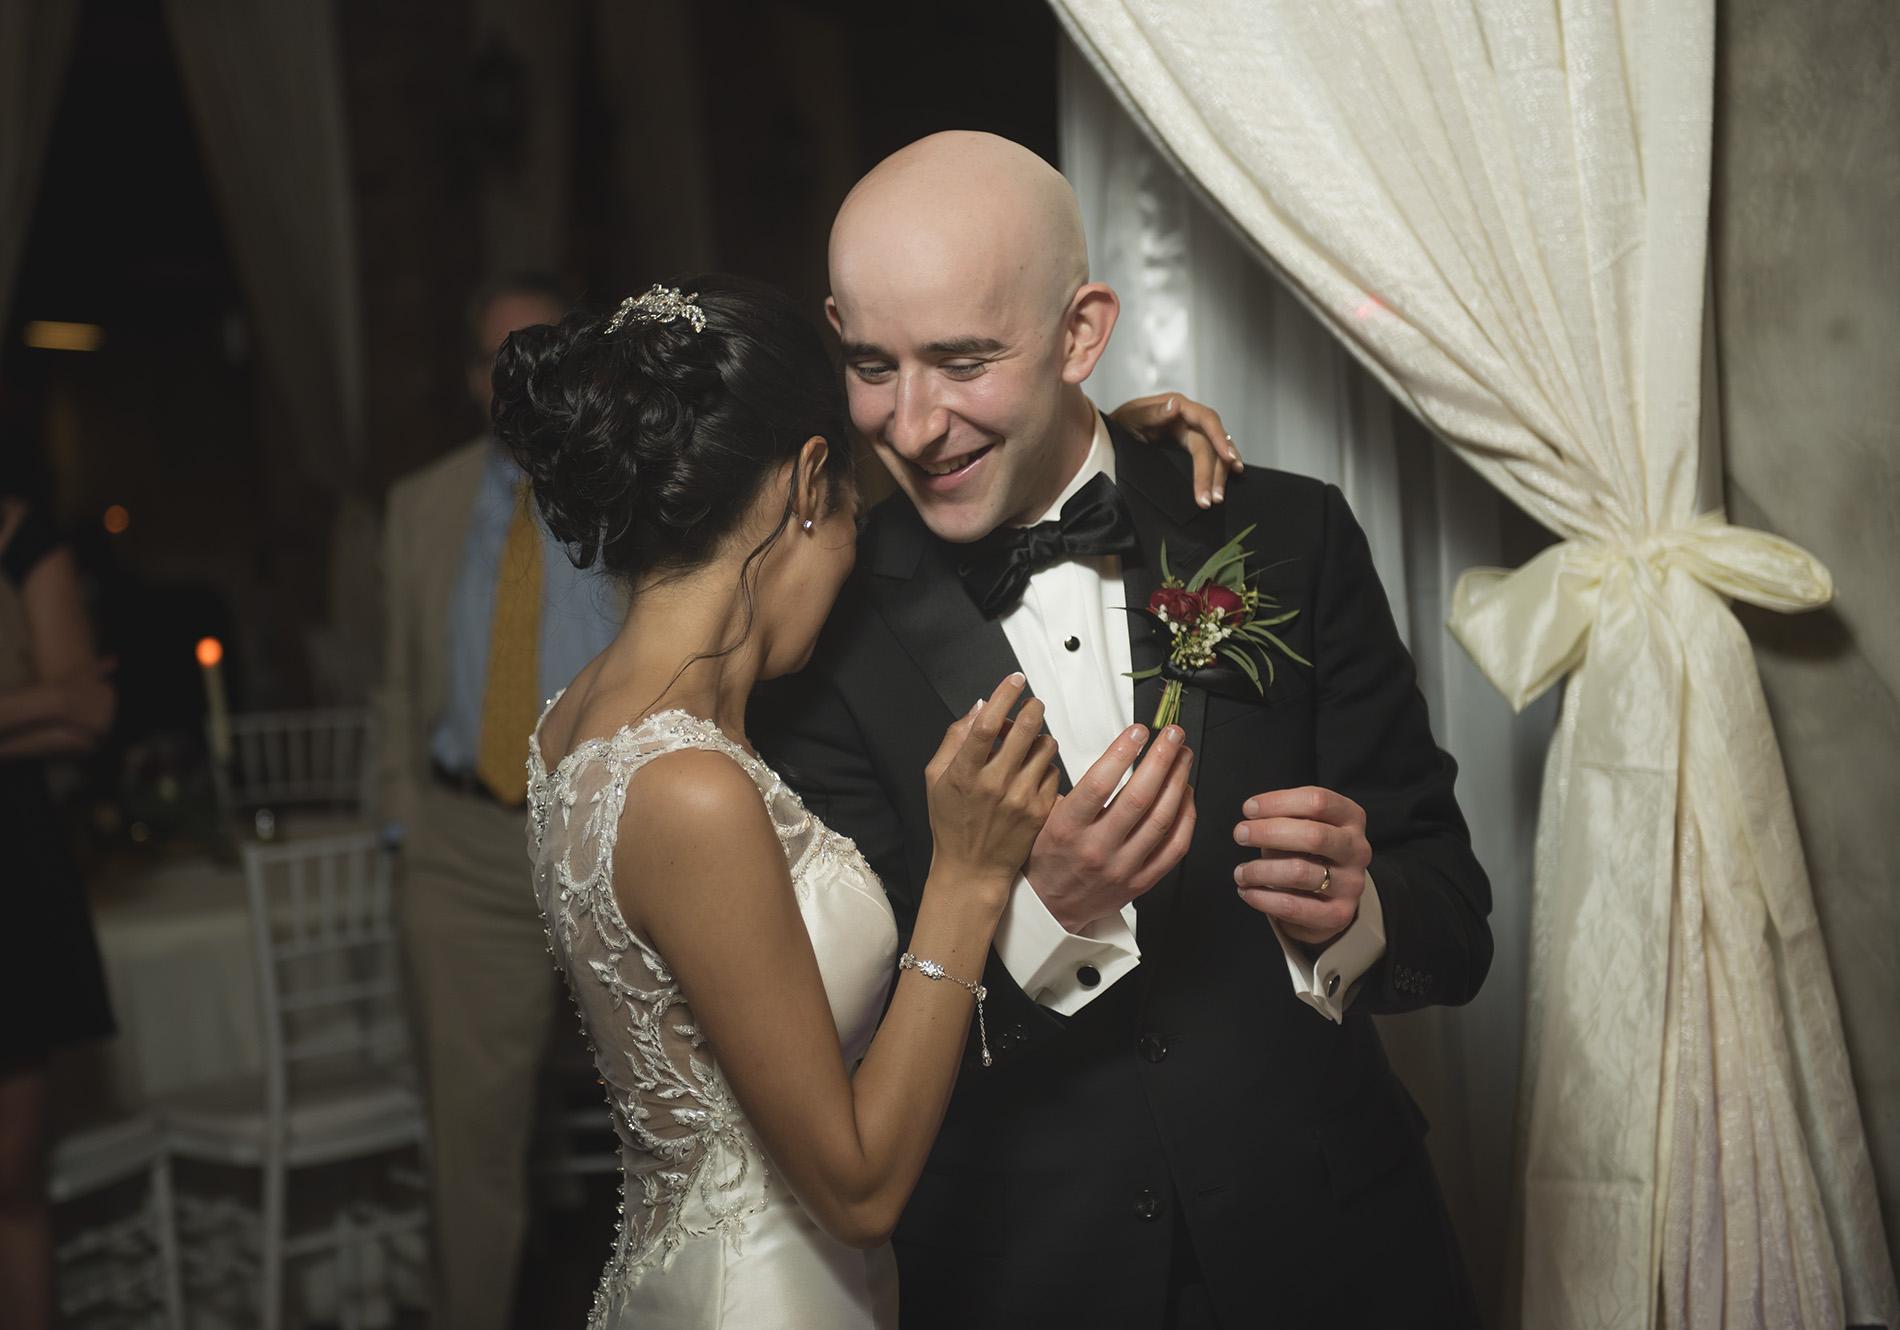 Houston-venue-Olde-Dobbin-Station-Romantic-Classic-Wedding-Photographer-106.jpg